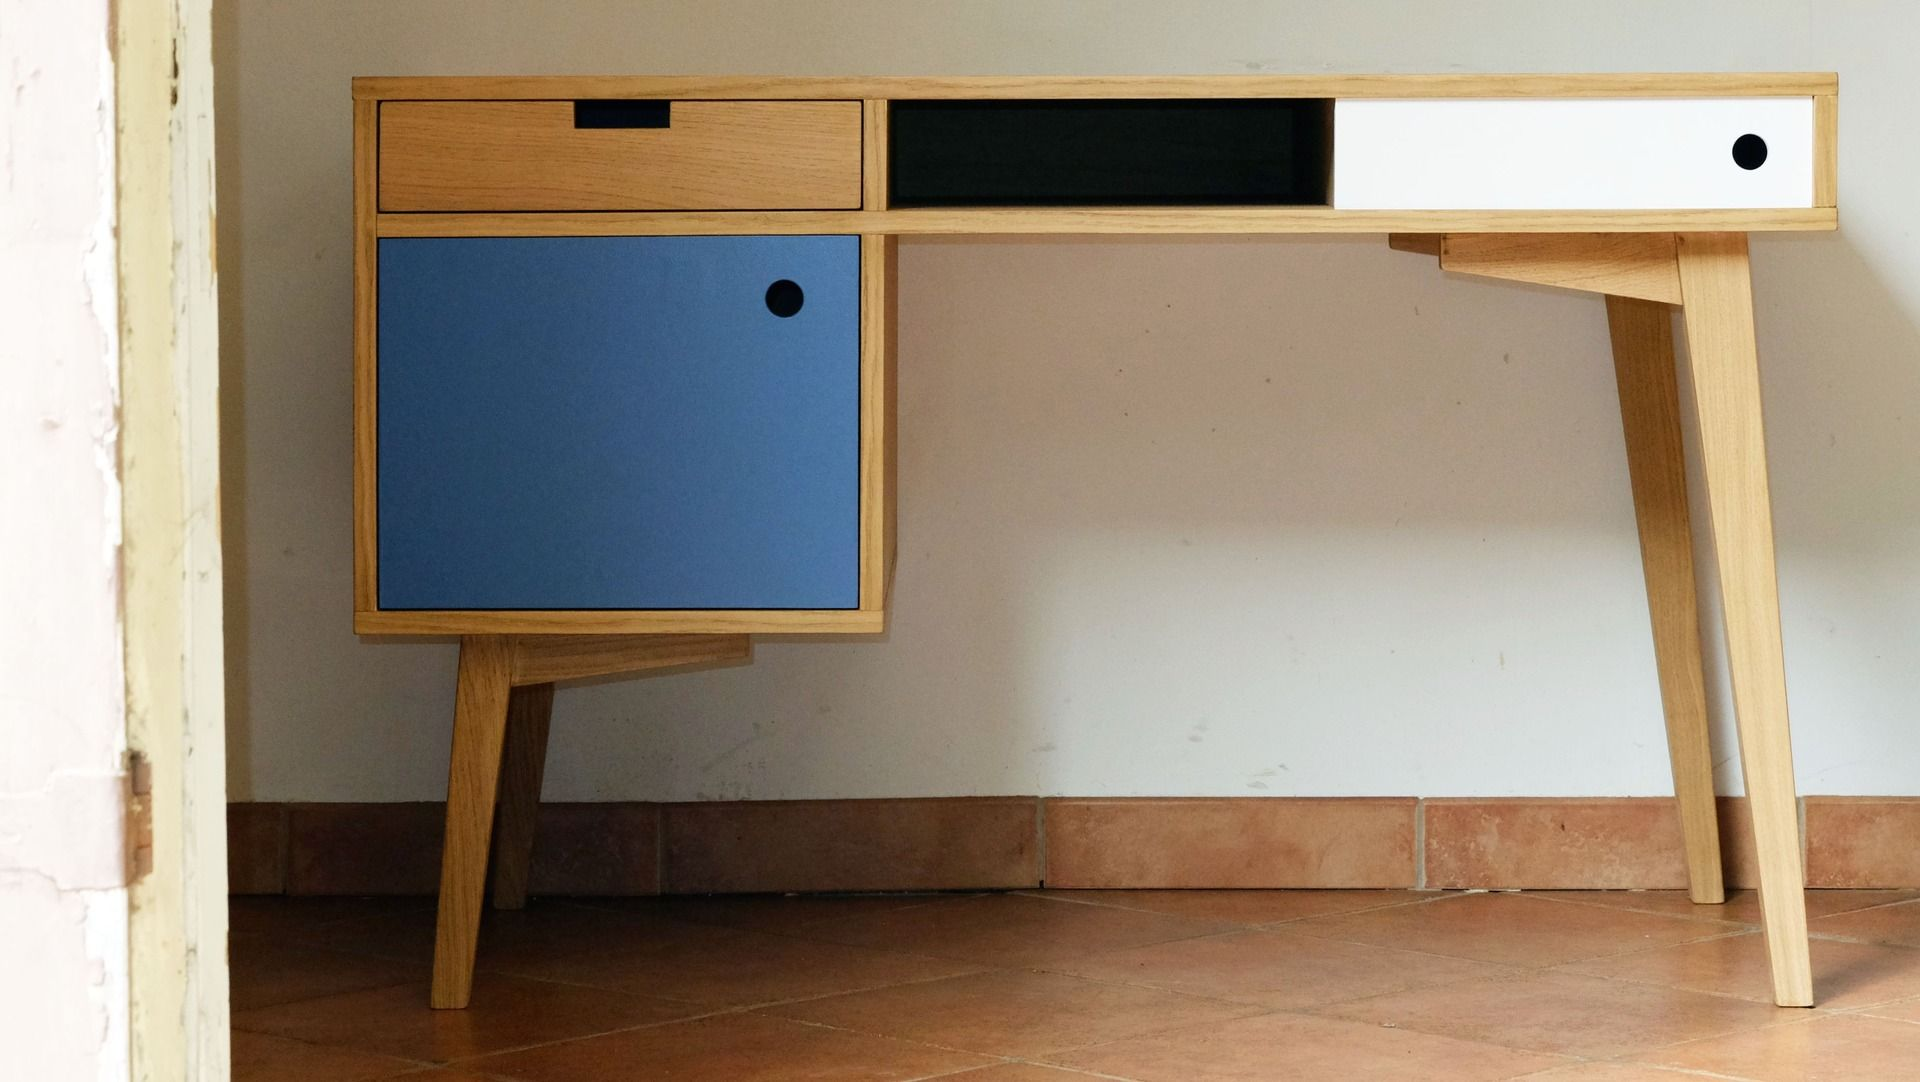 Bureau style scandinave en chªne conteneur Havre